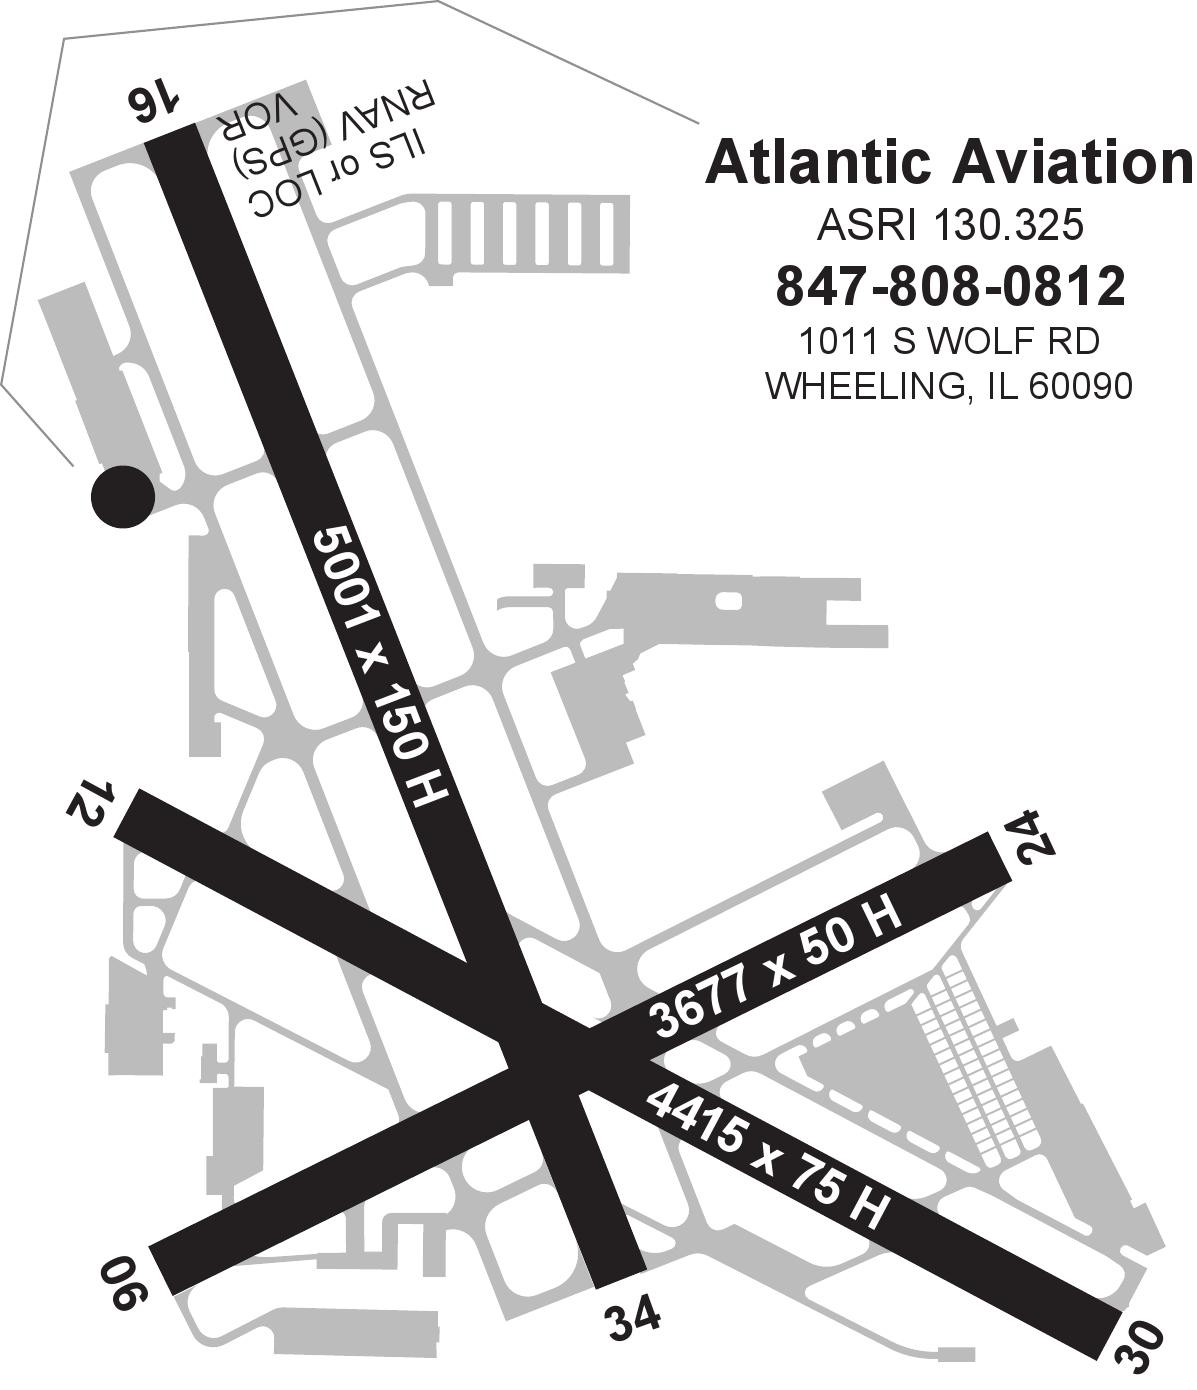 Atlantic Aviation